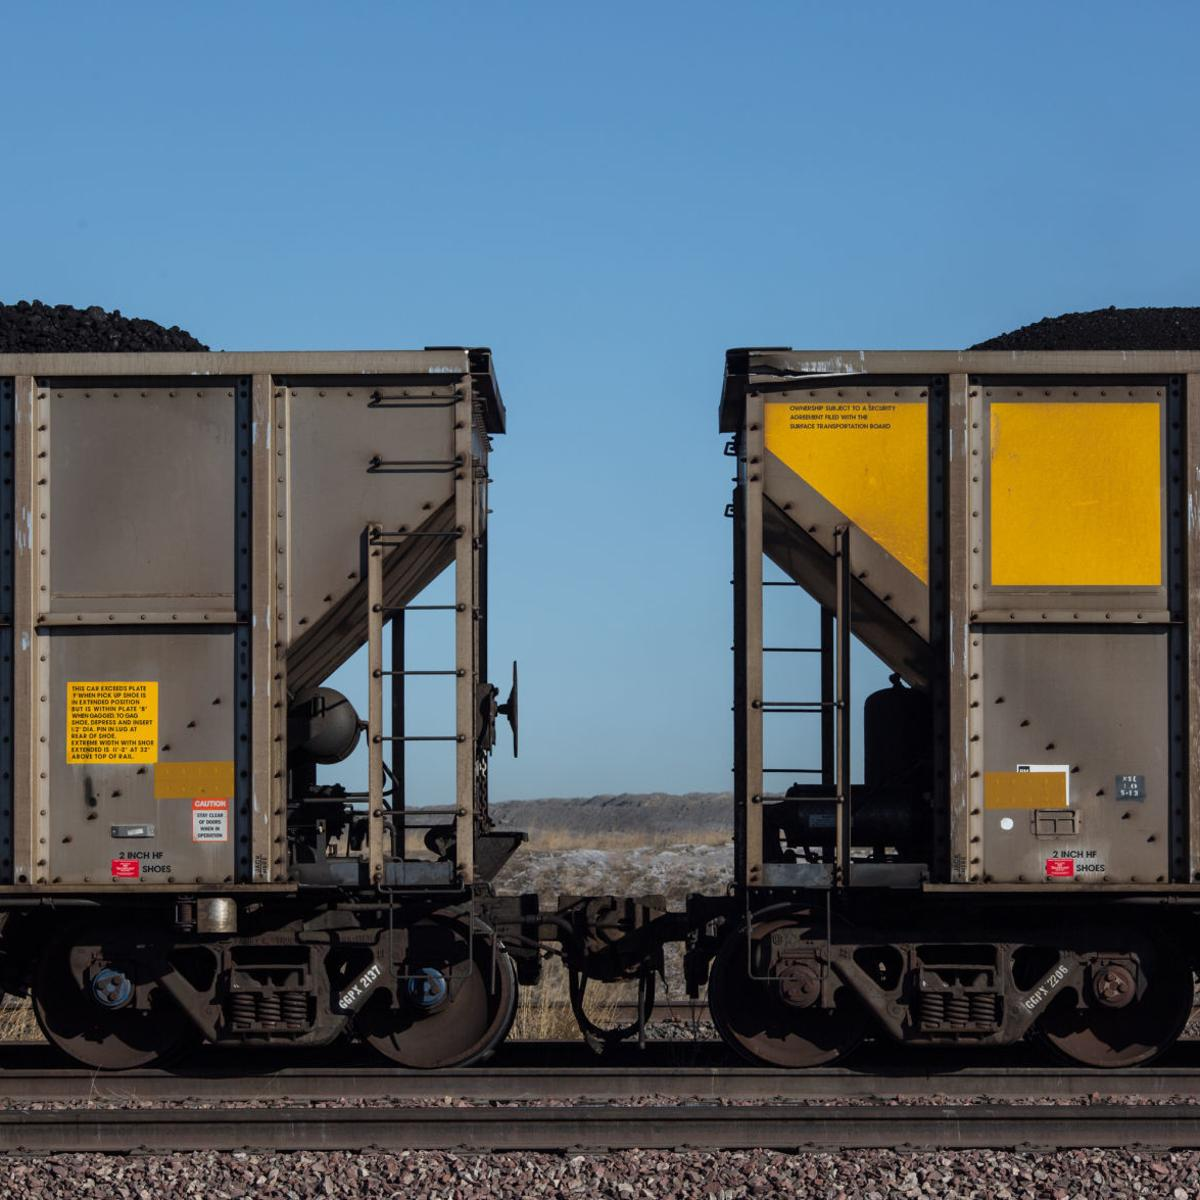 Report: Powder River Basin faces increasing risk from coal decline